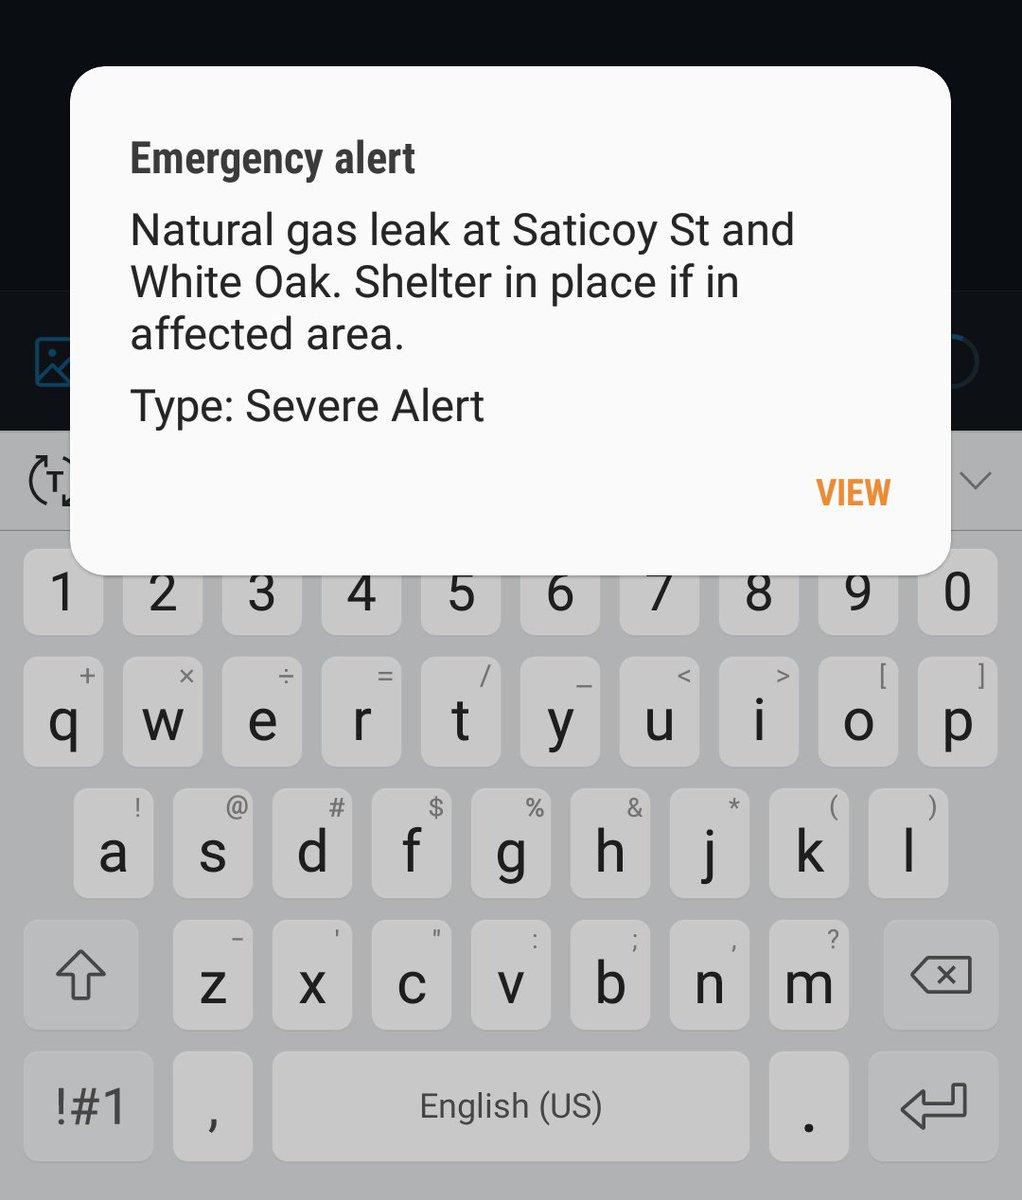 emergencyalert hashtag on Twitter